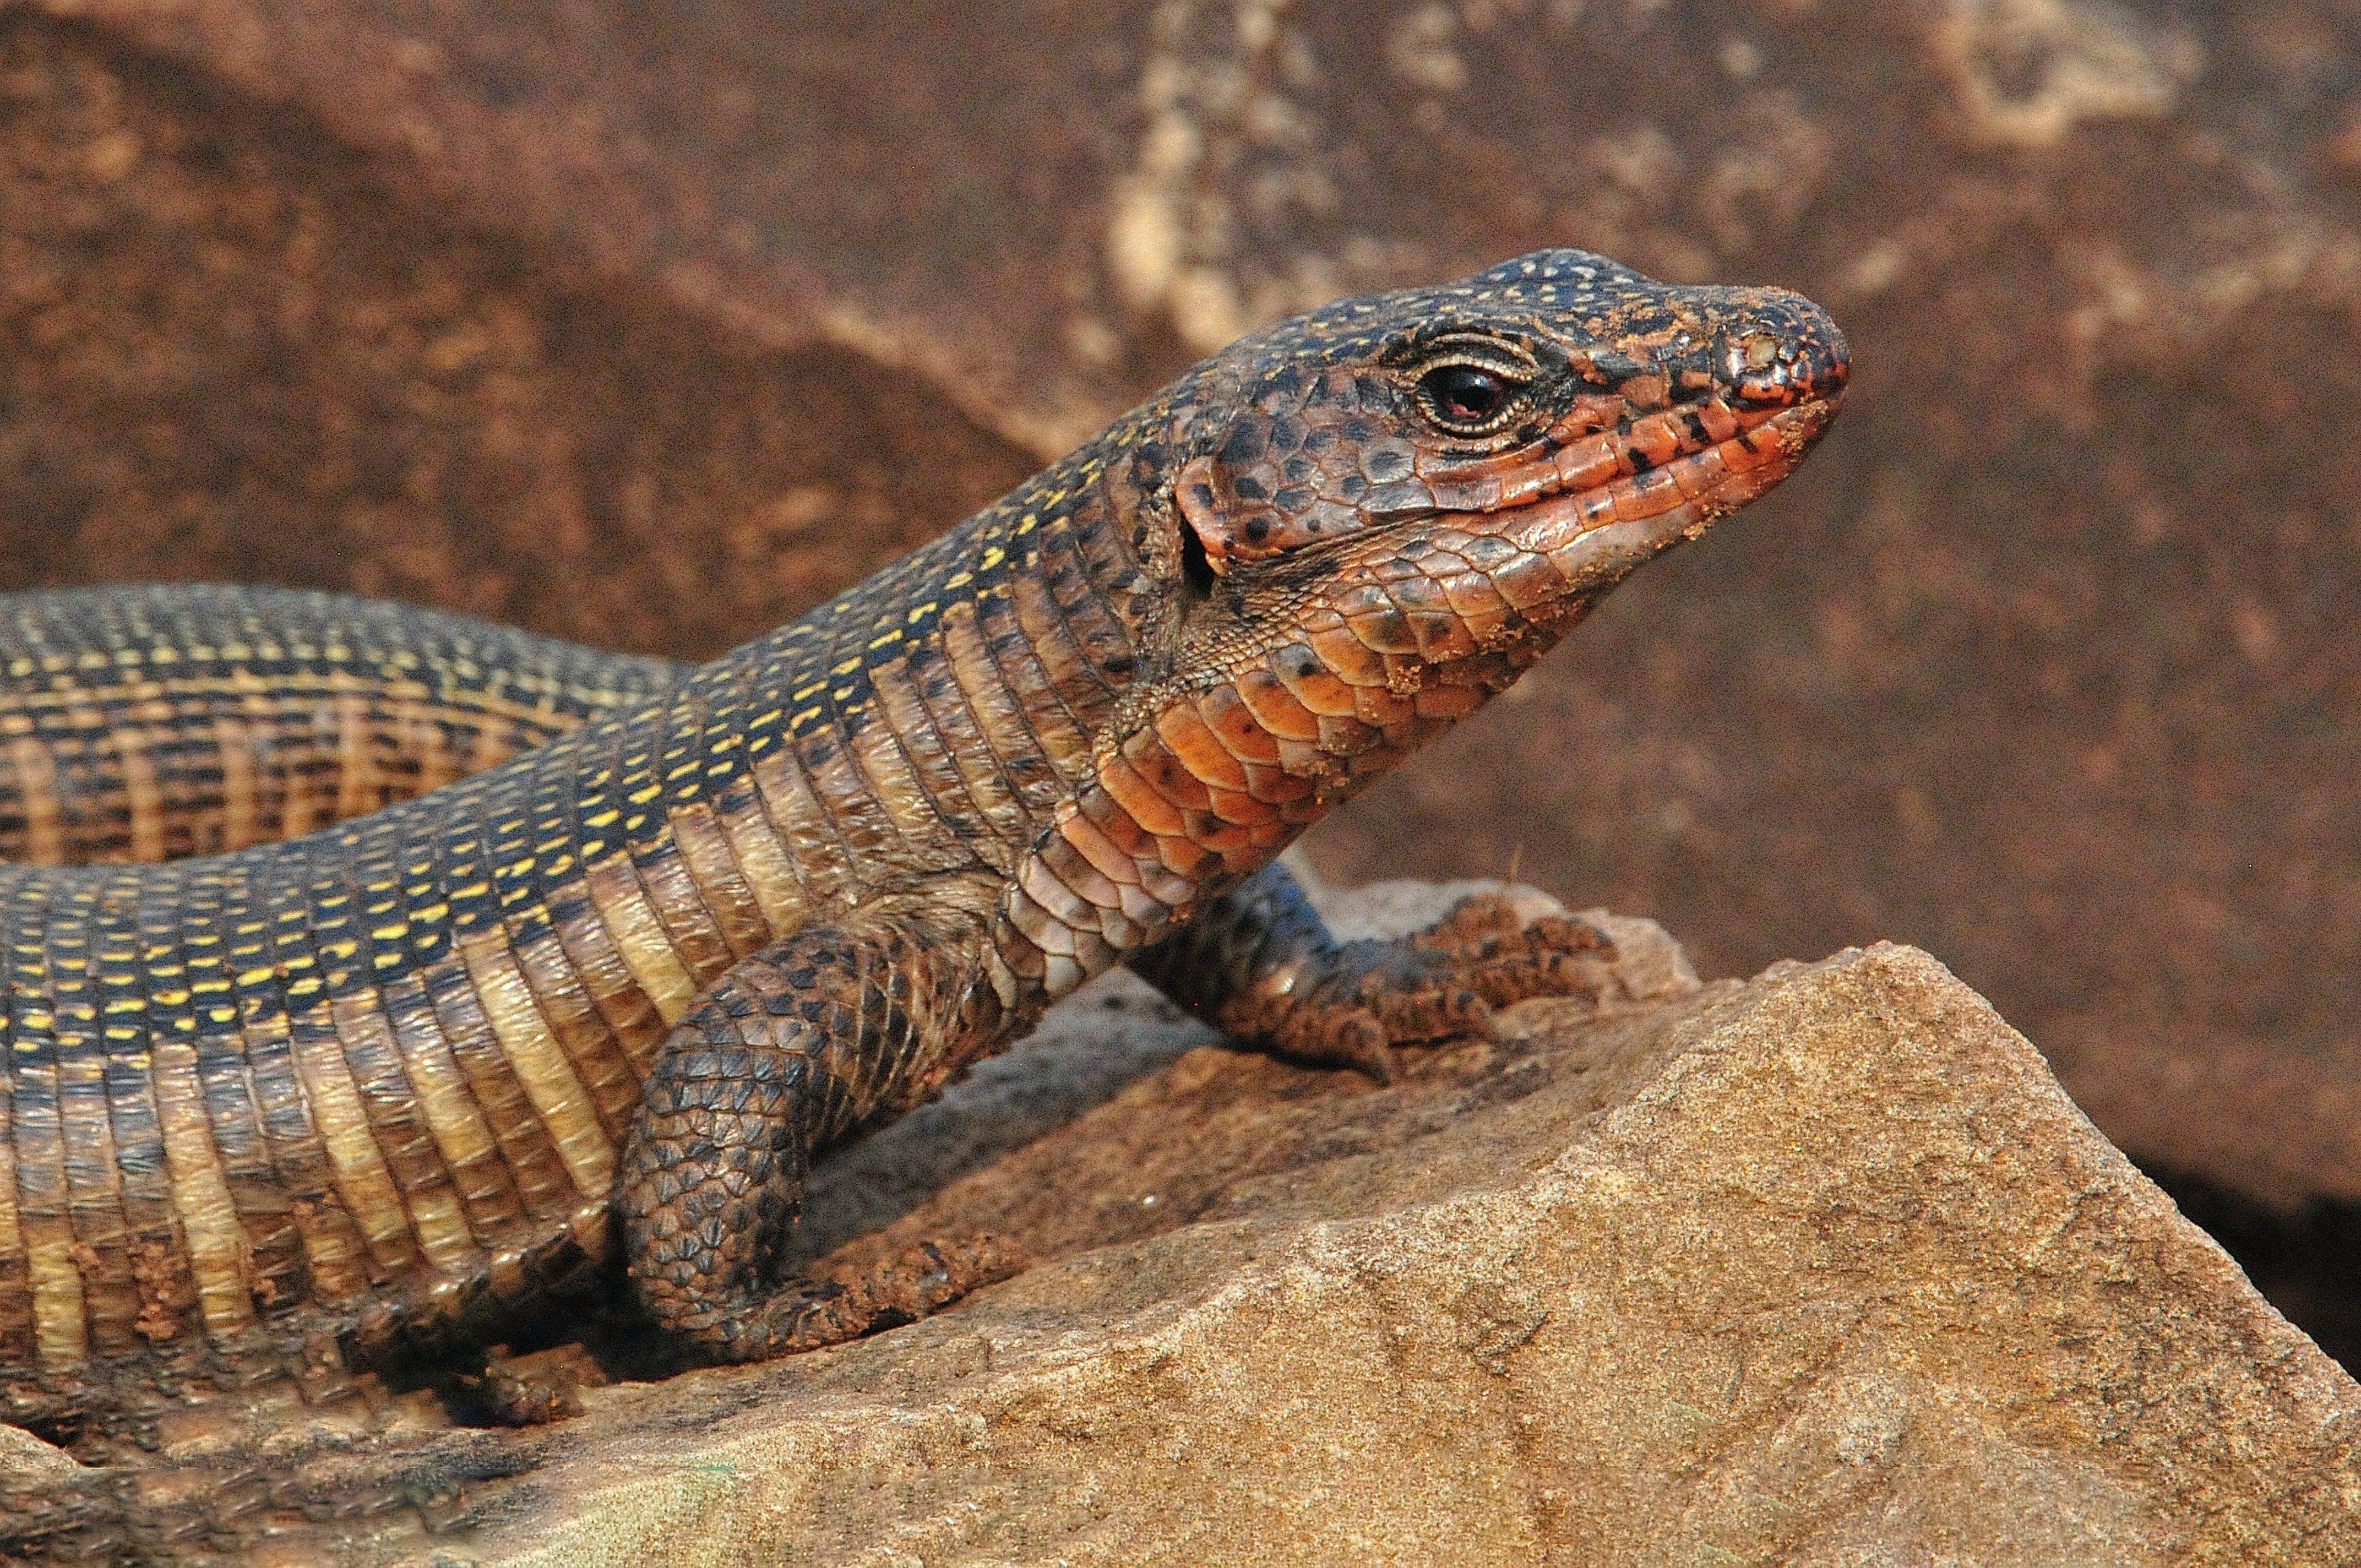 Close-Up Photo of Lizard on Rock